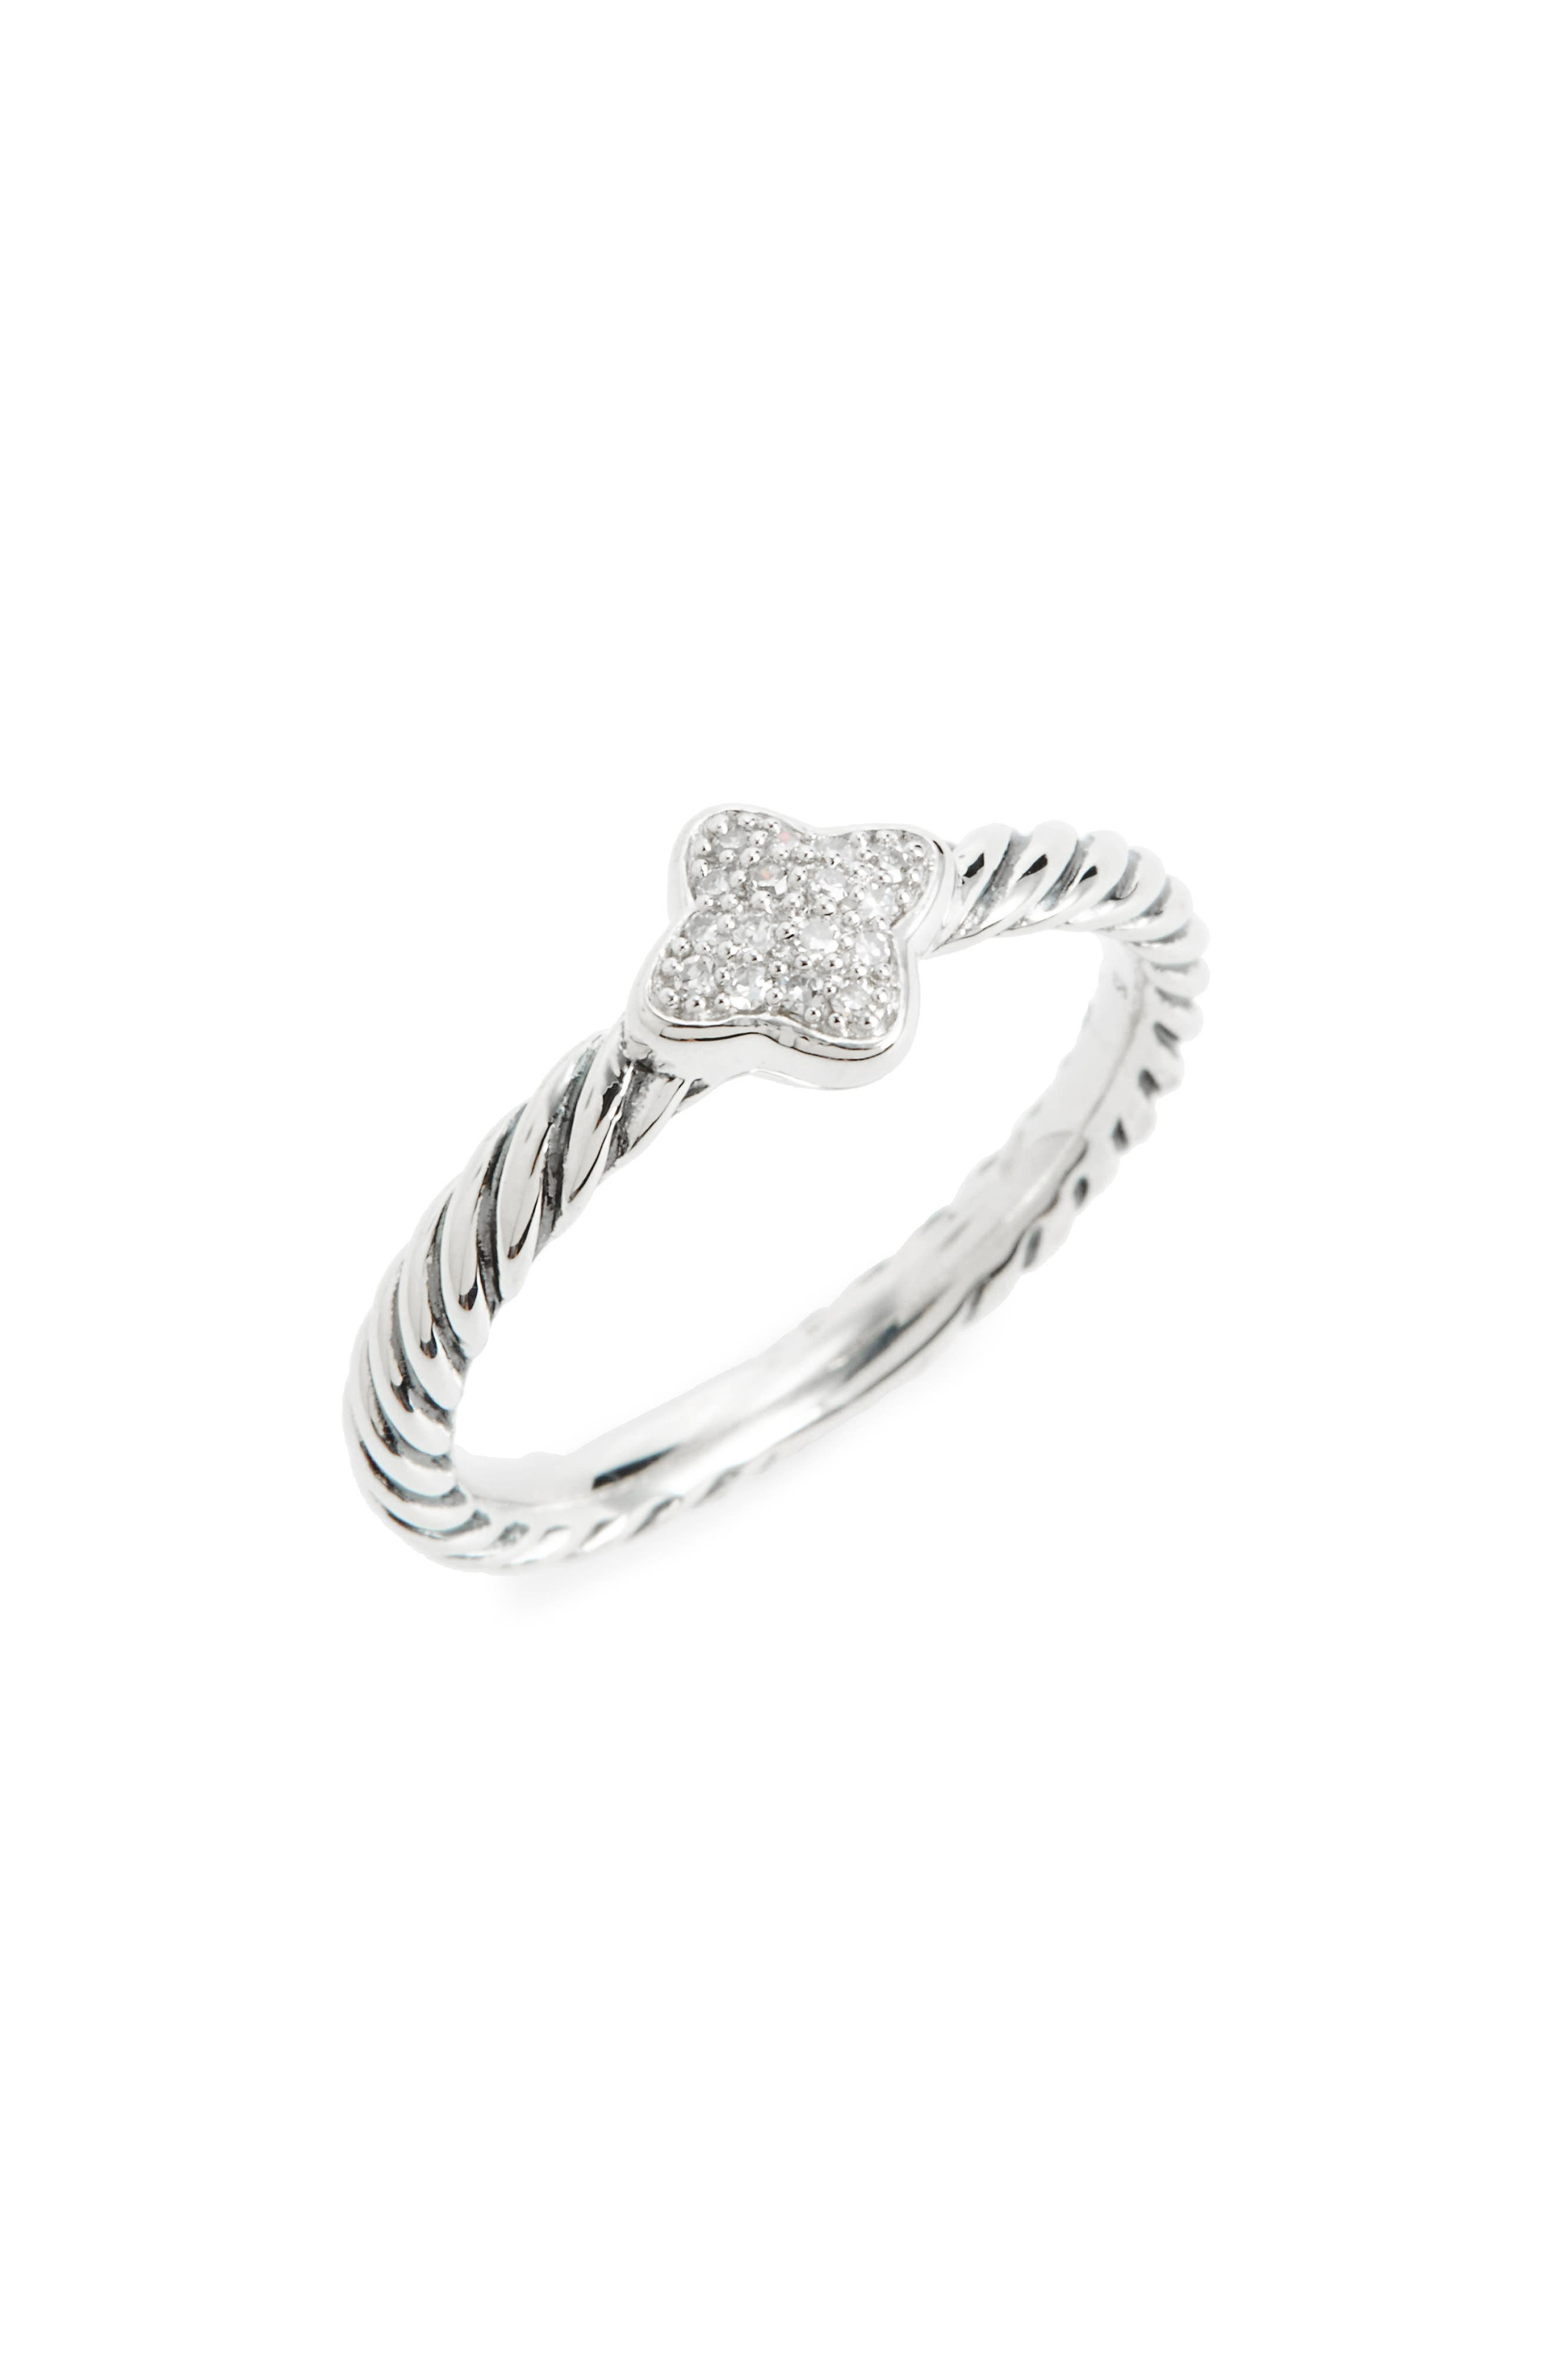 Quatrefoil Ring with Diamonds,                         Main,                         color, Diamond